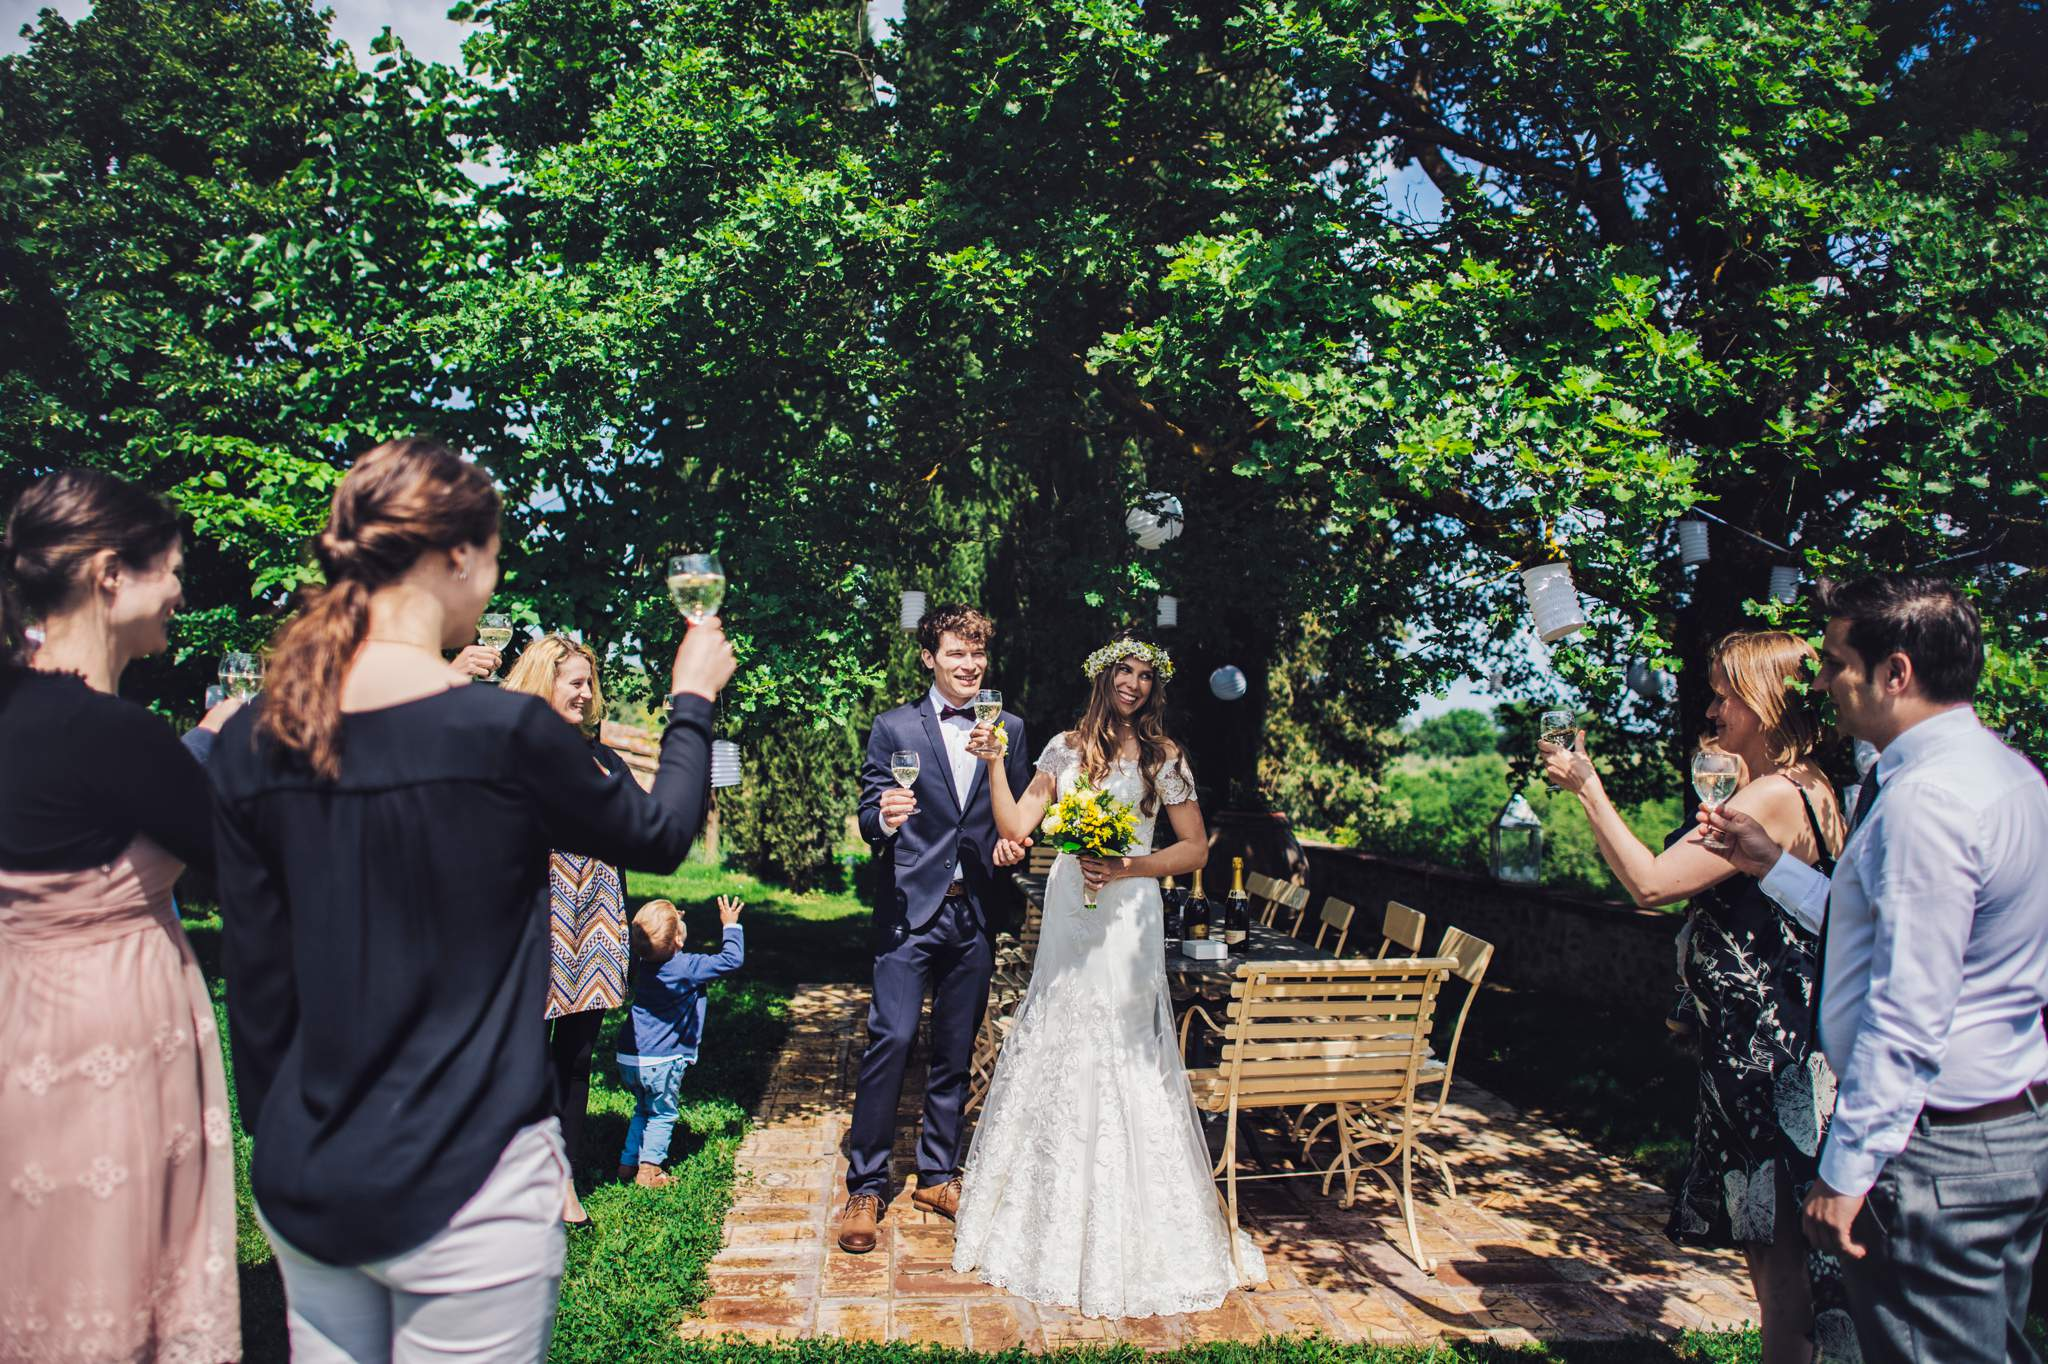 23wedding-photographer-tuscany-siena